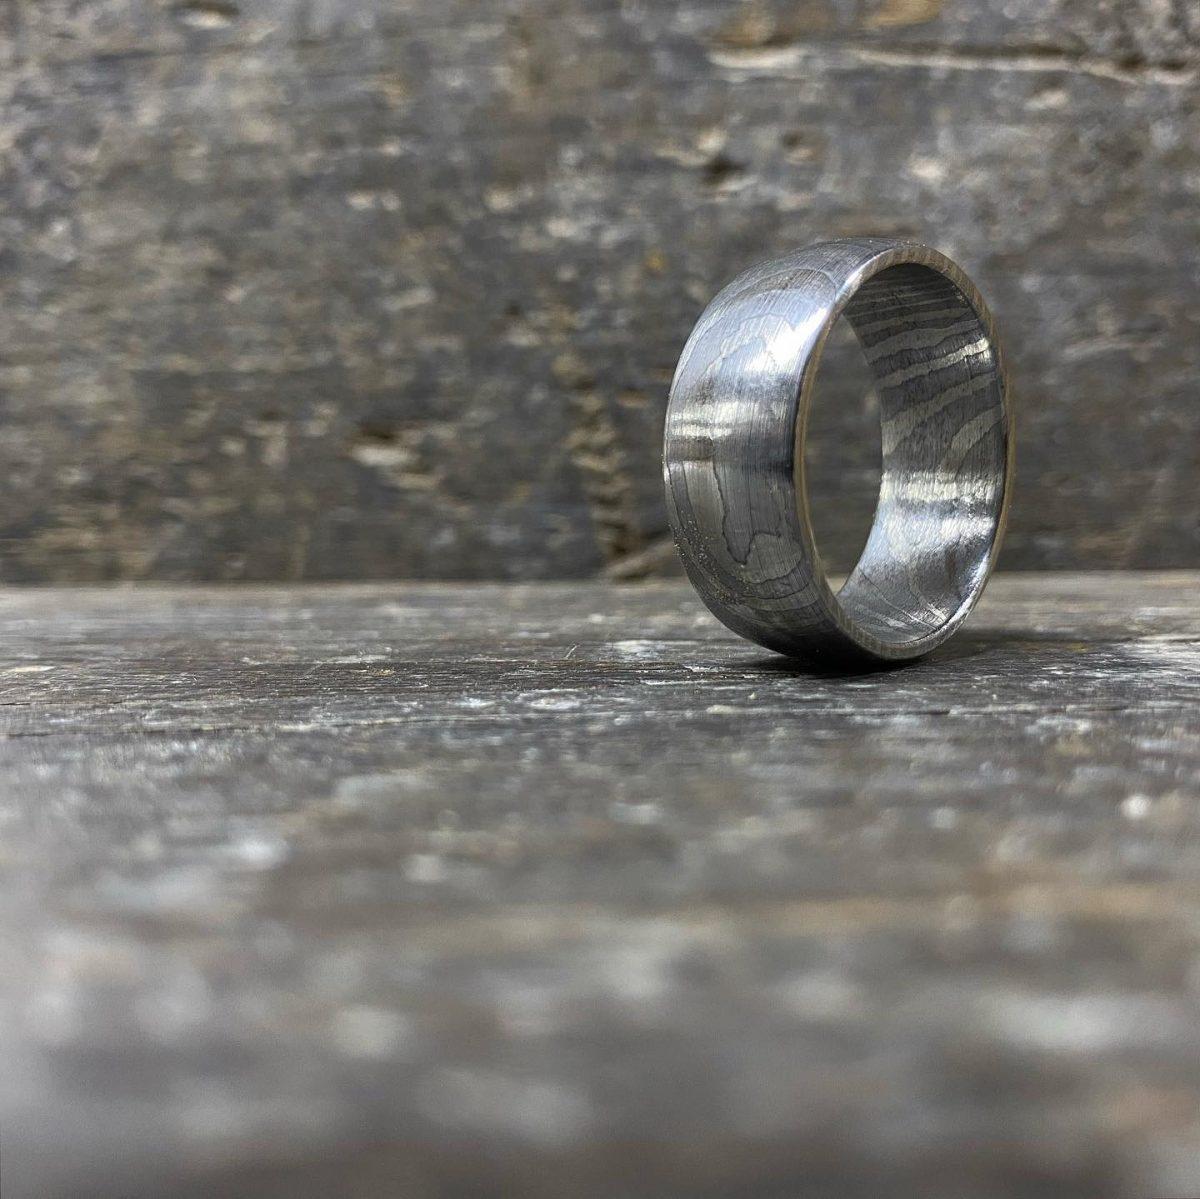 Damascus Steel Ring